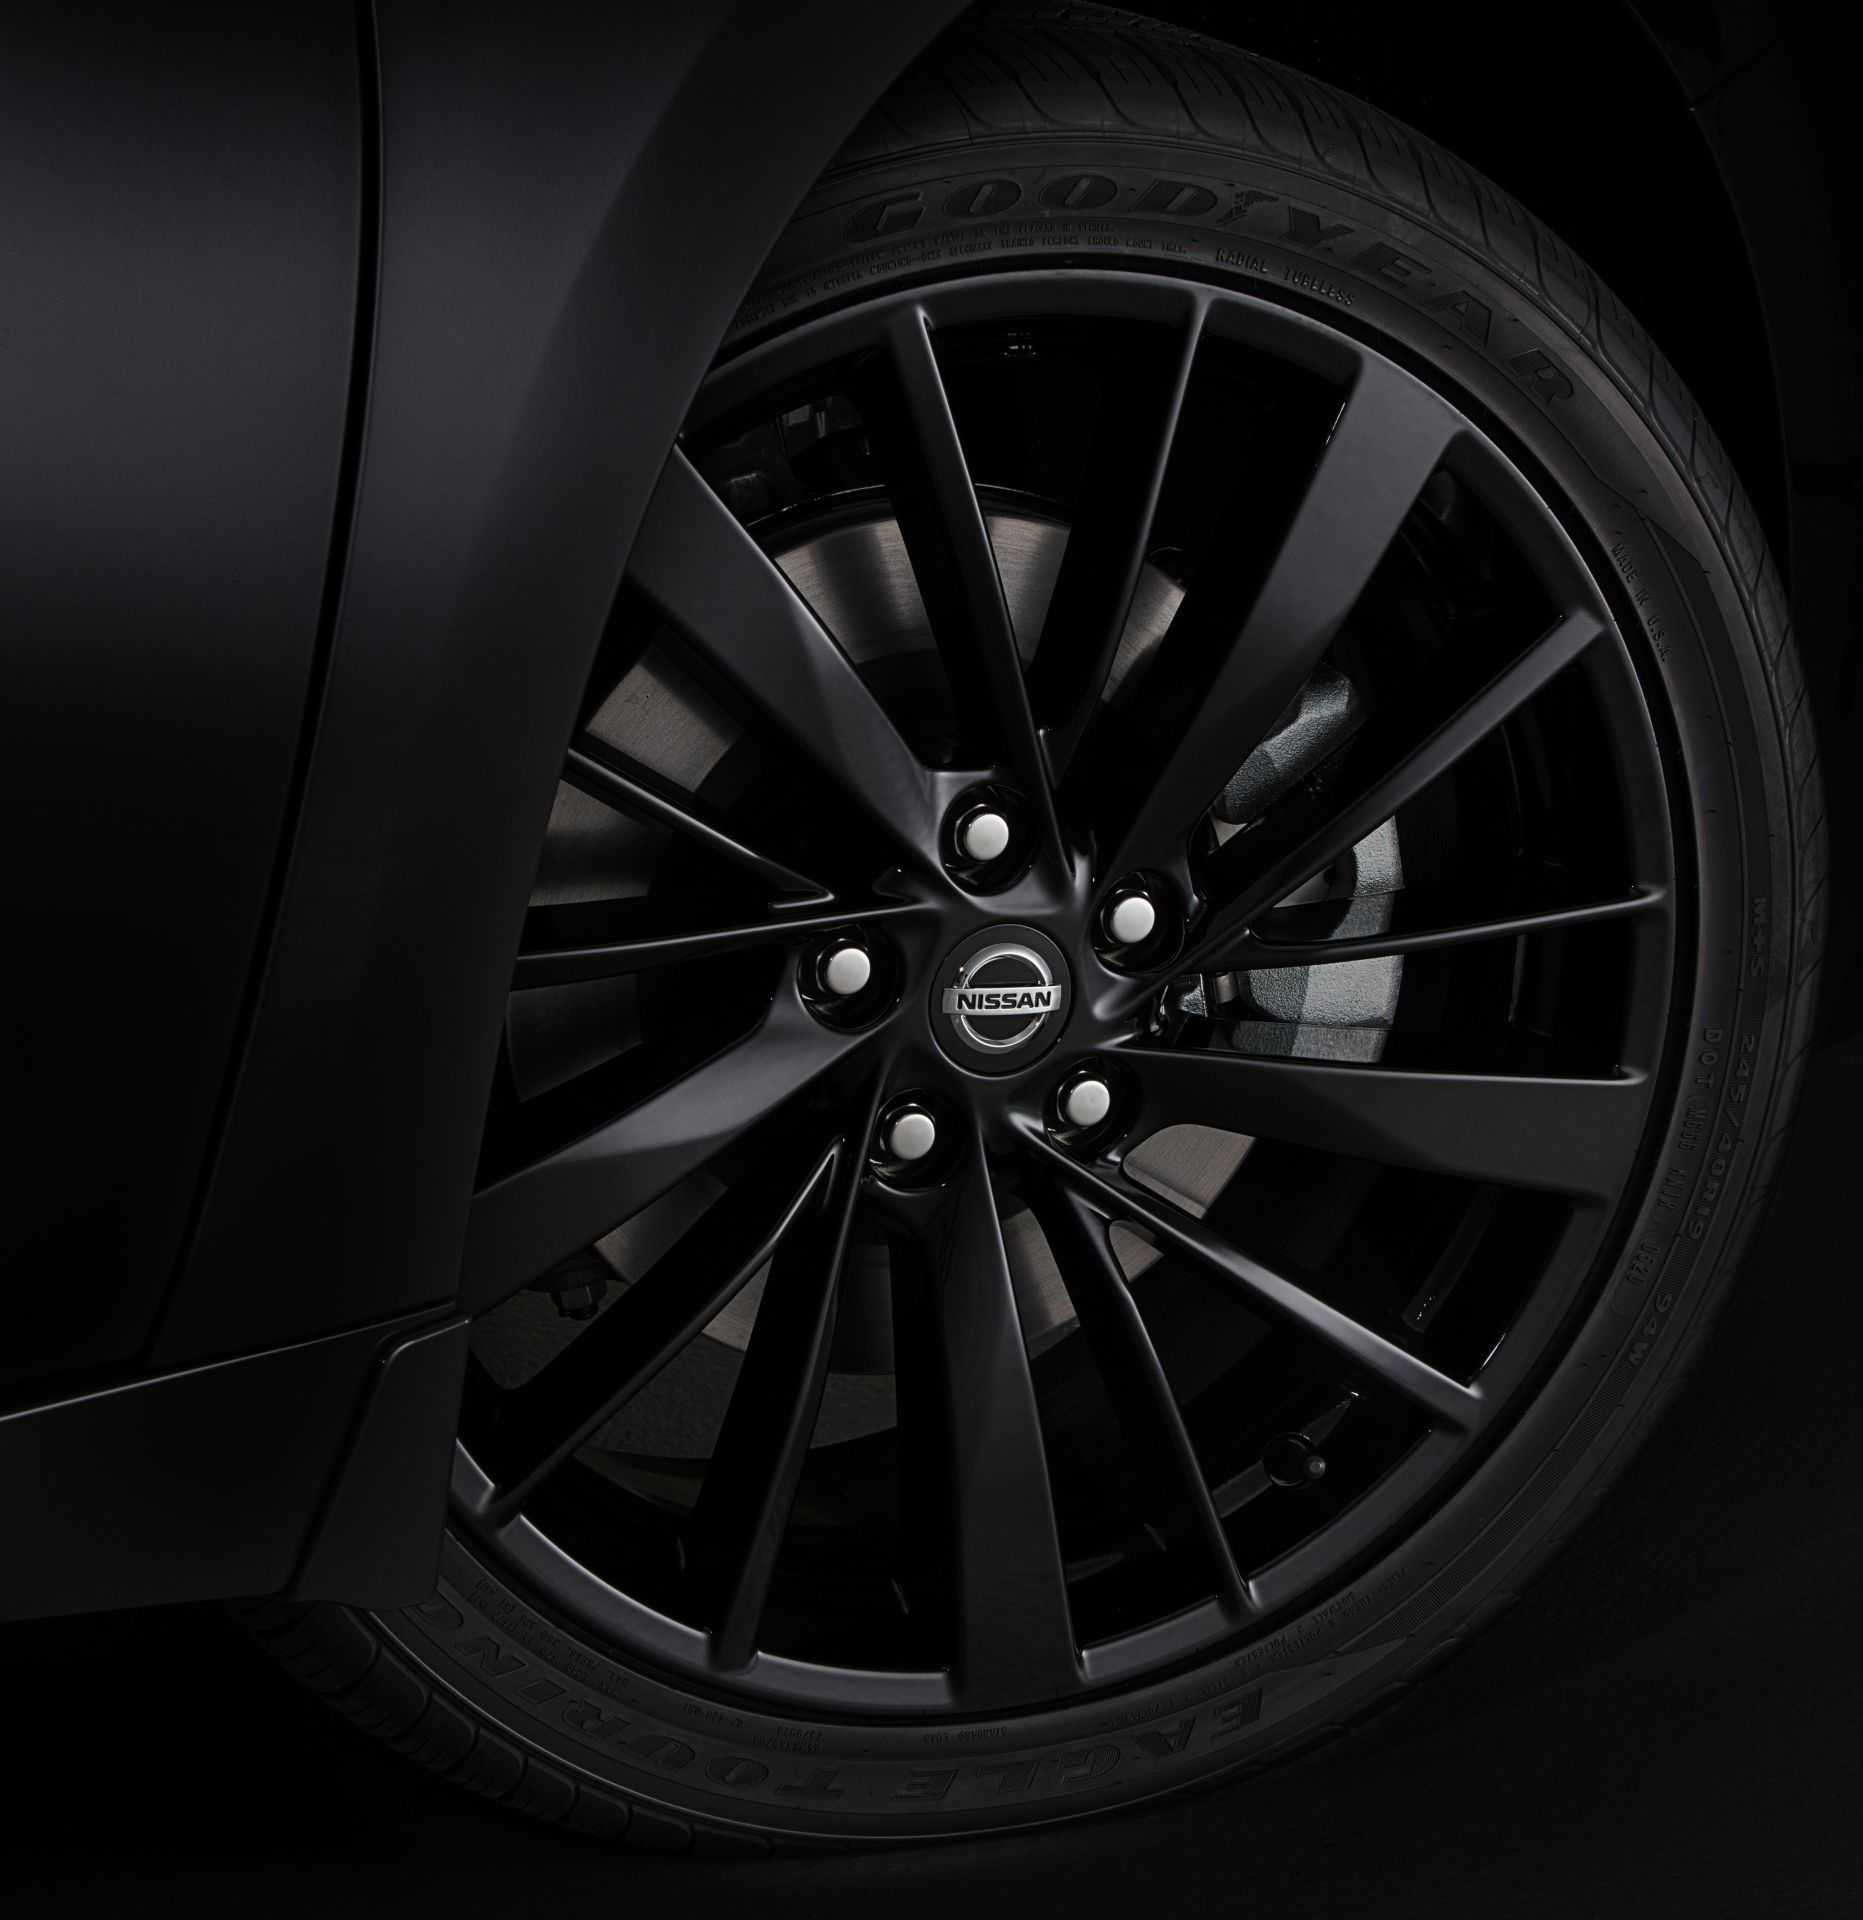 Nissan-Maxima-40th-Anniversary-Edition-23